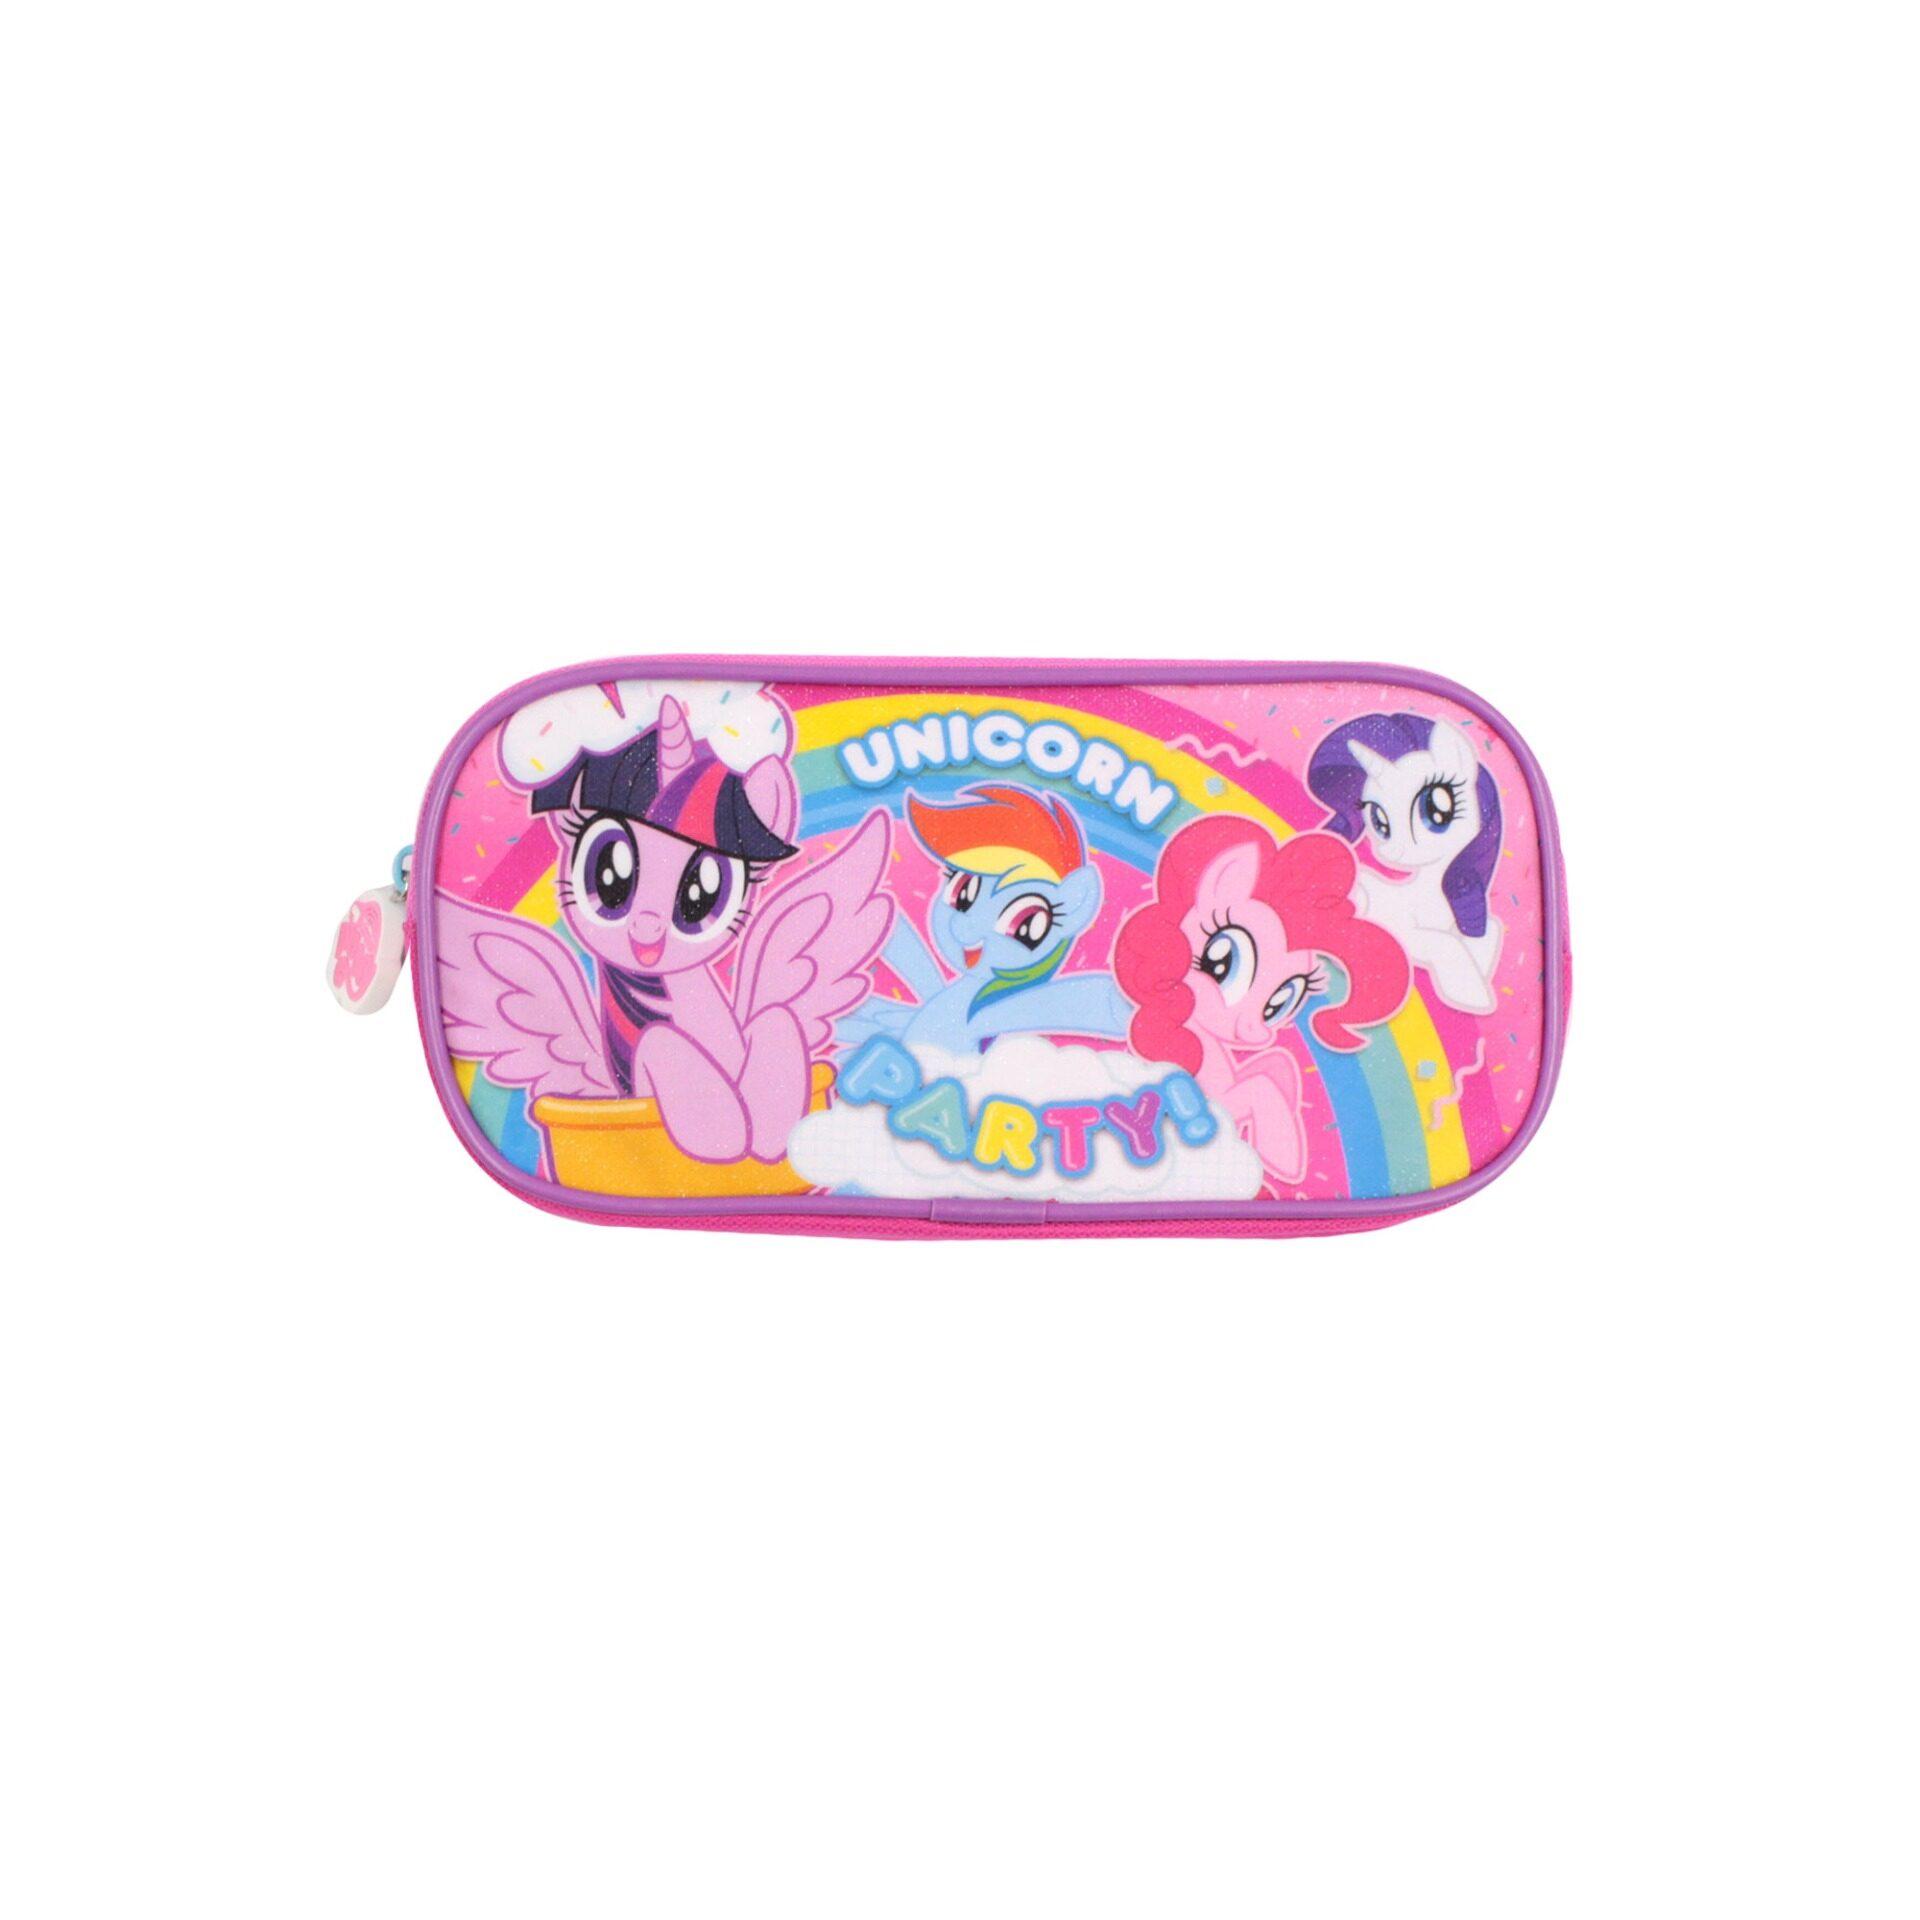 My Little Pony Unicorn Party! Children School Stationery Single Zip Pencil Case